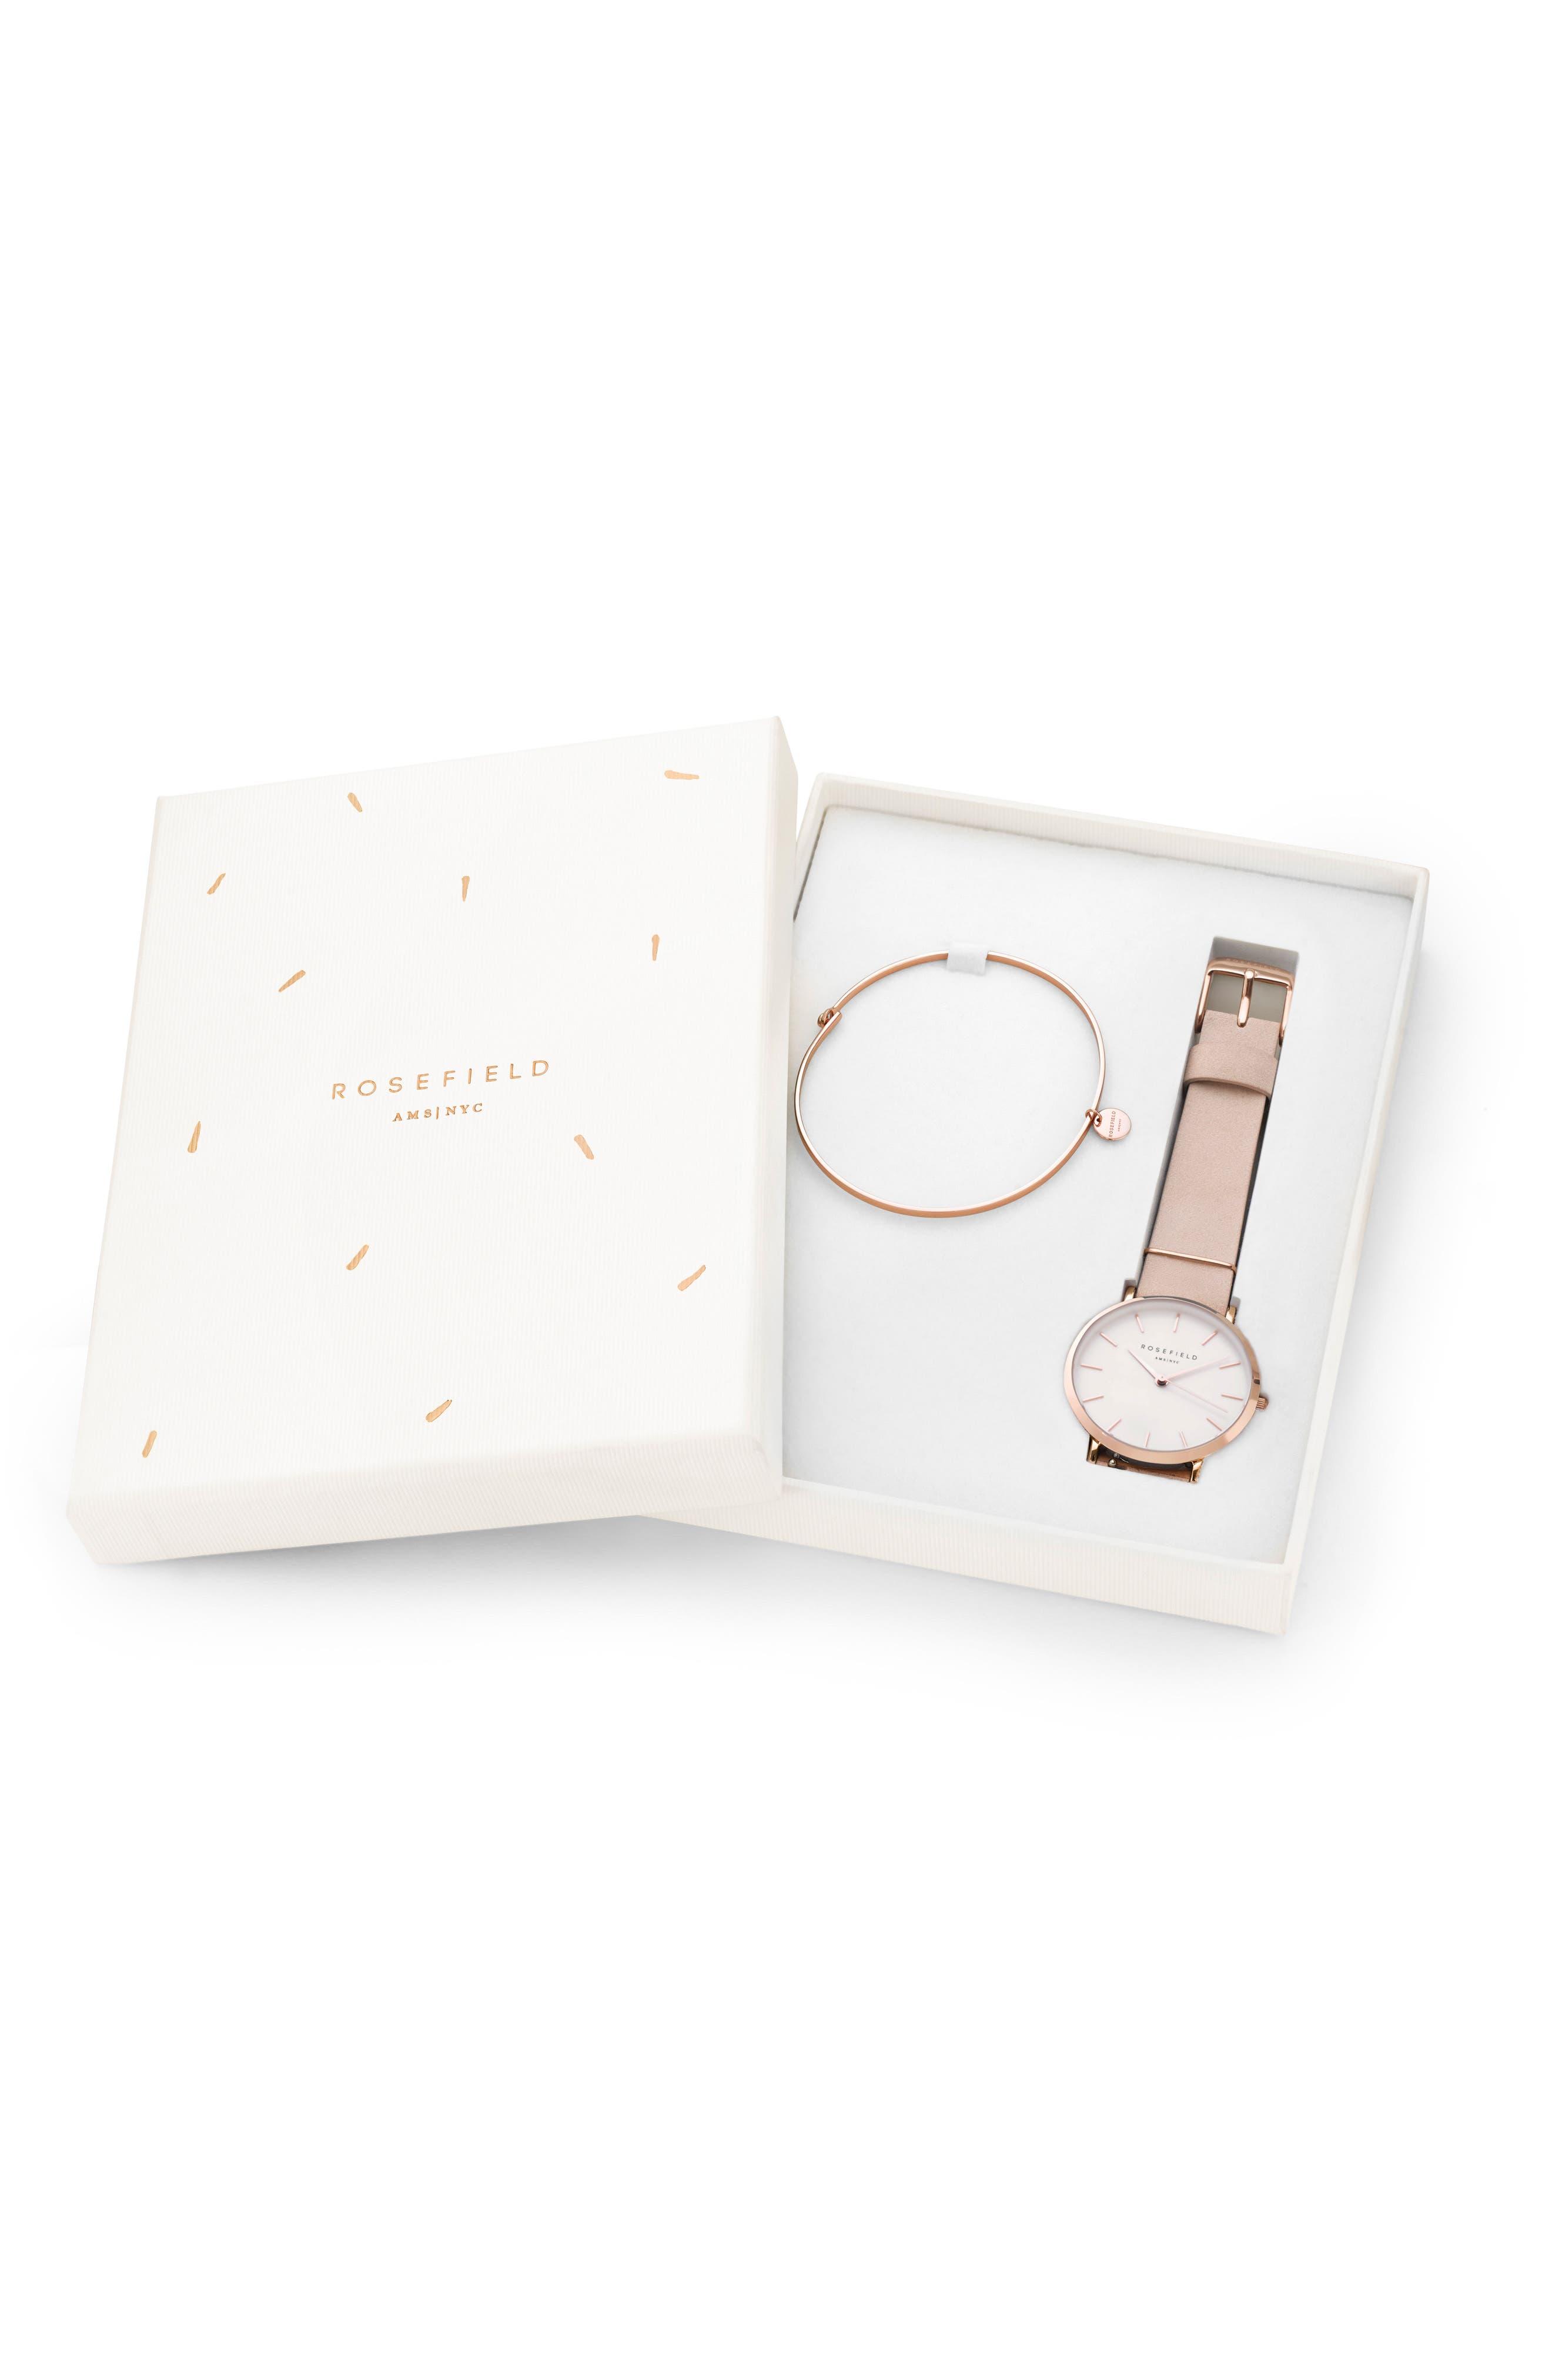 Holiday Leather Strap Watch & Bracelet Gift Set, 33mm,                             Alternate thumbnail 6, color,                             Pink/ Rose Gold